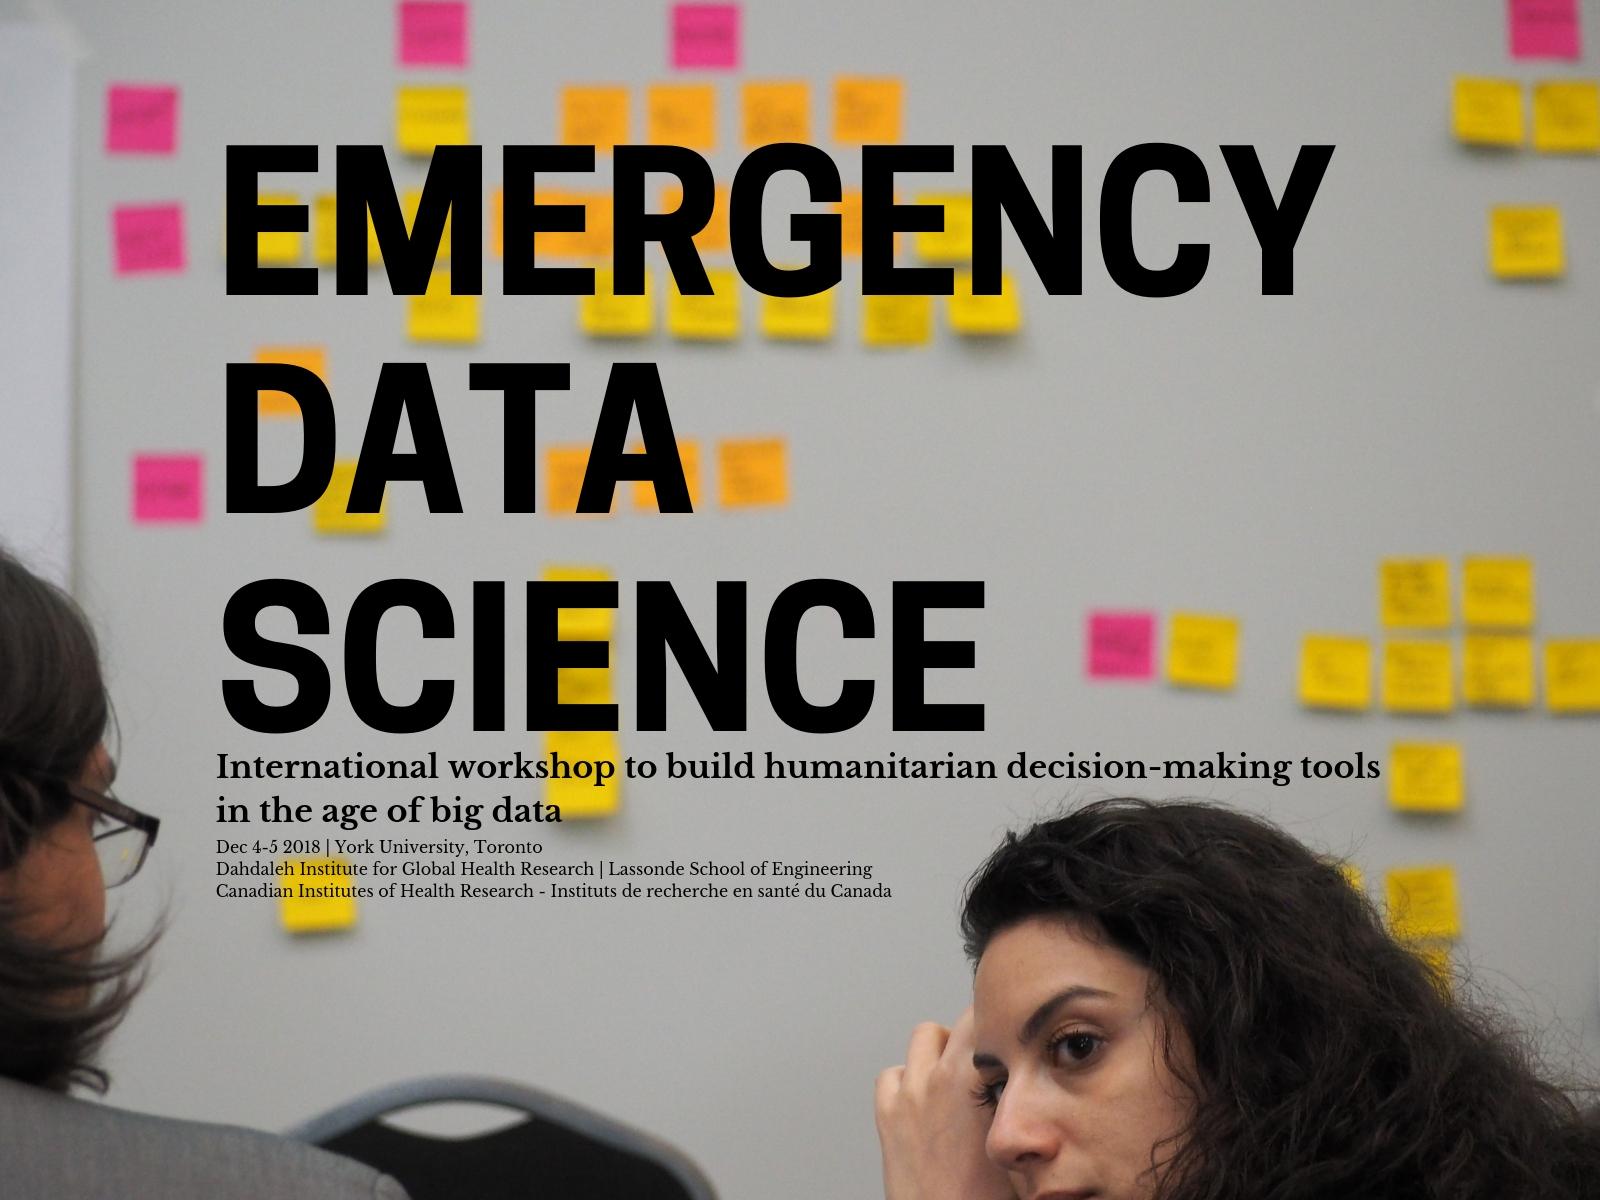 EMERGENCY-DATA-SCIENCE